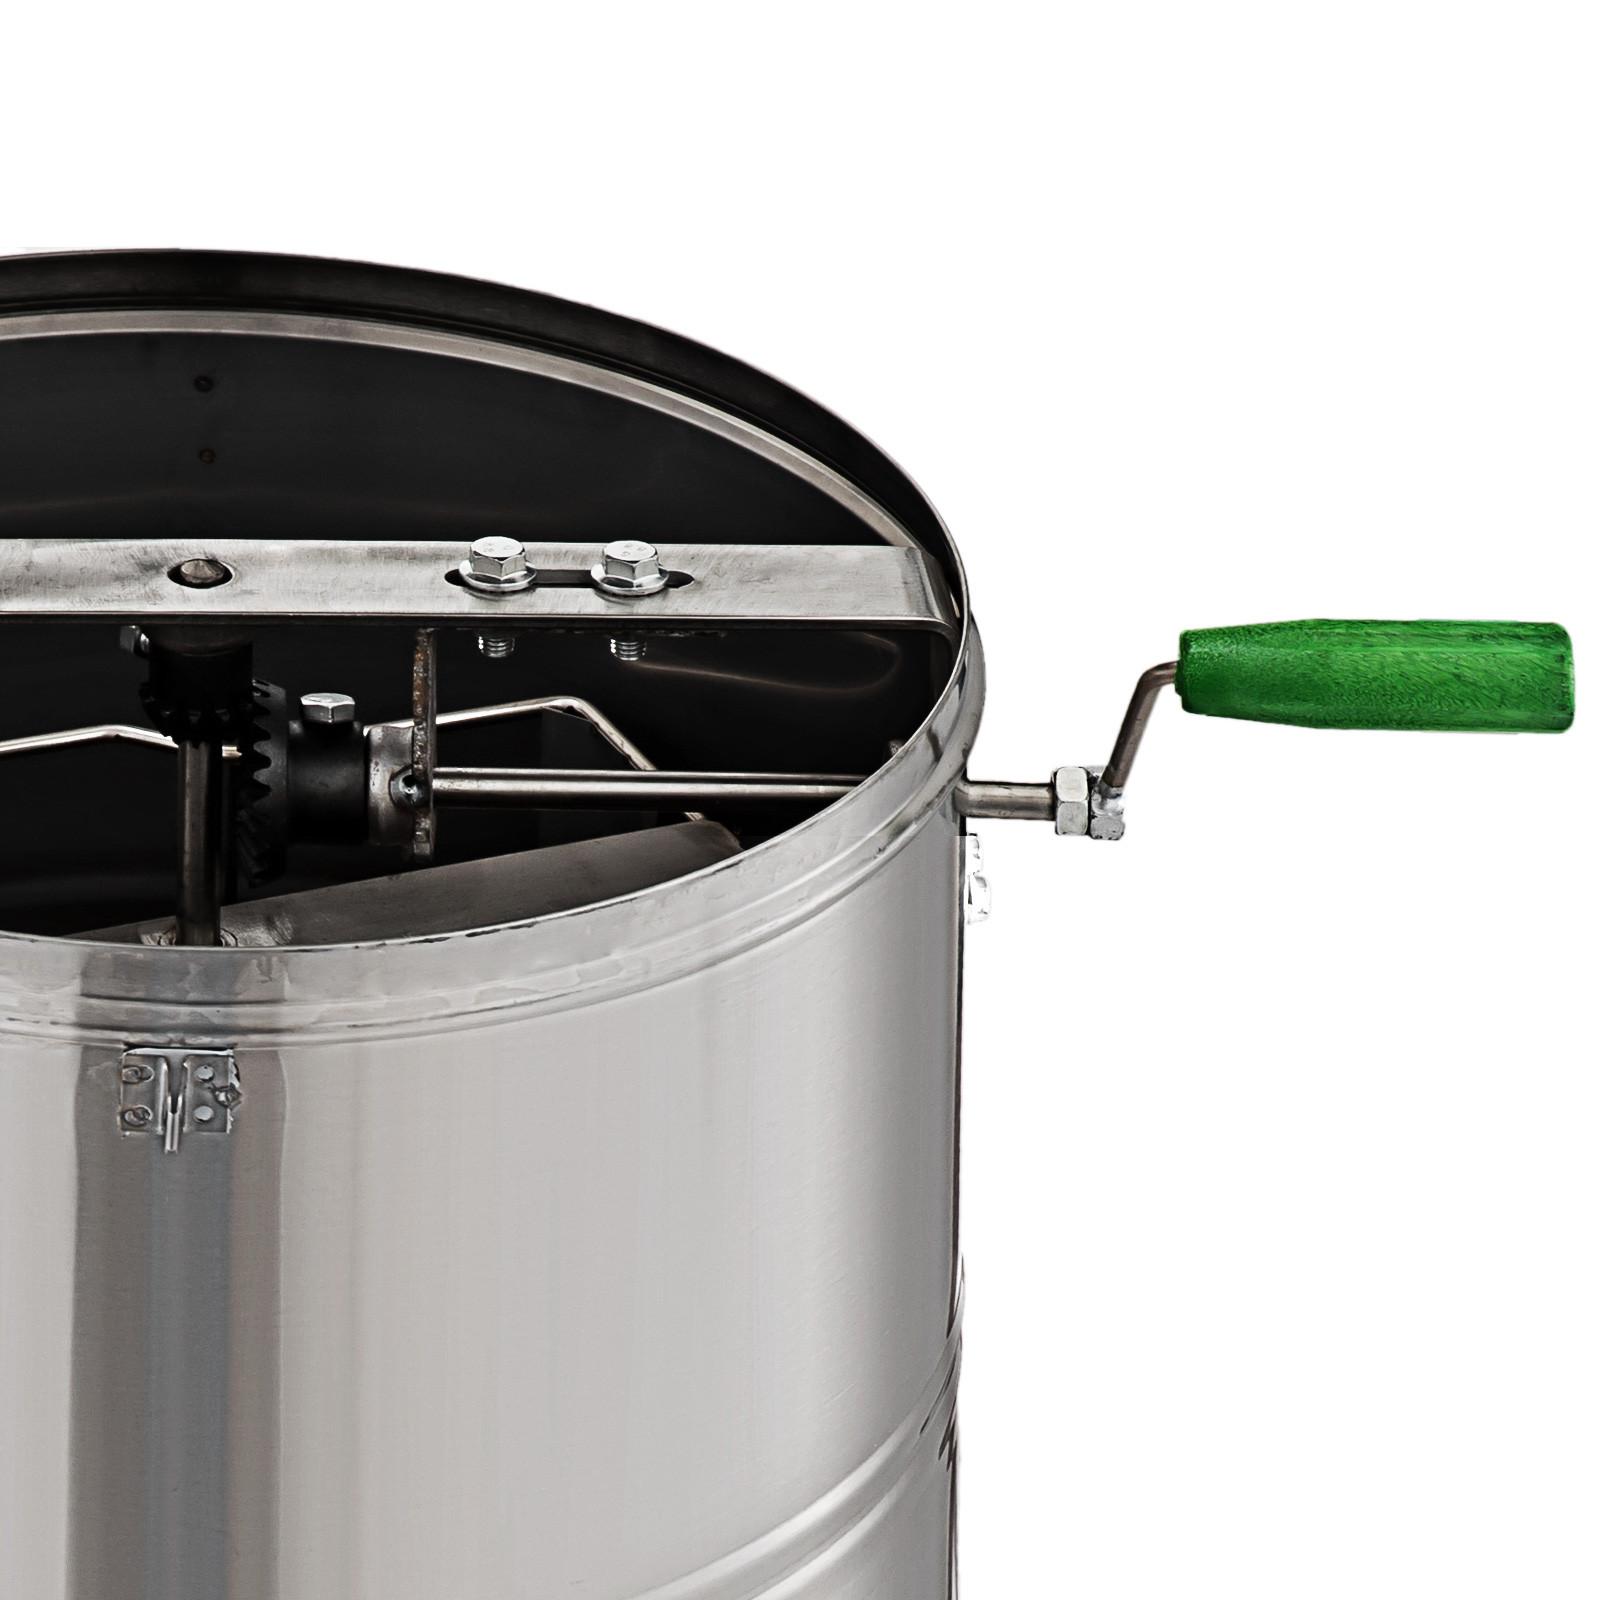 Extracteur-de-Miel-Electrique-manuelle-2-3-4-Cadres-En-Acier-Inox-Centrifugeuse miniature 22